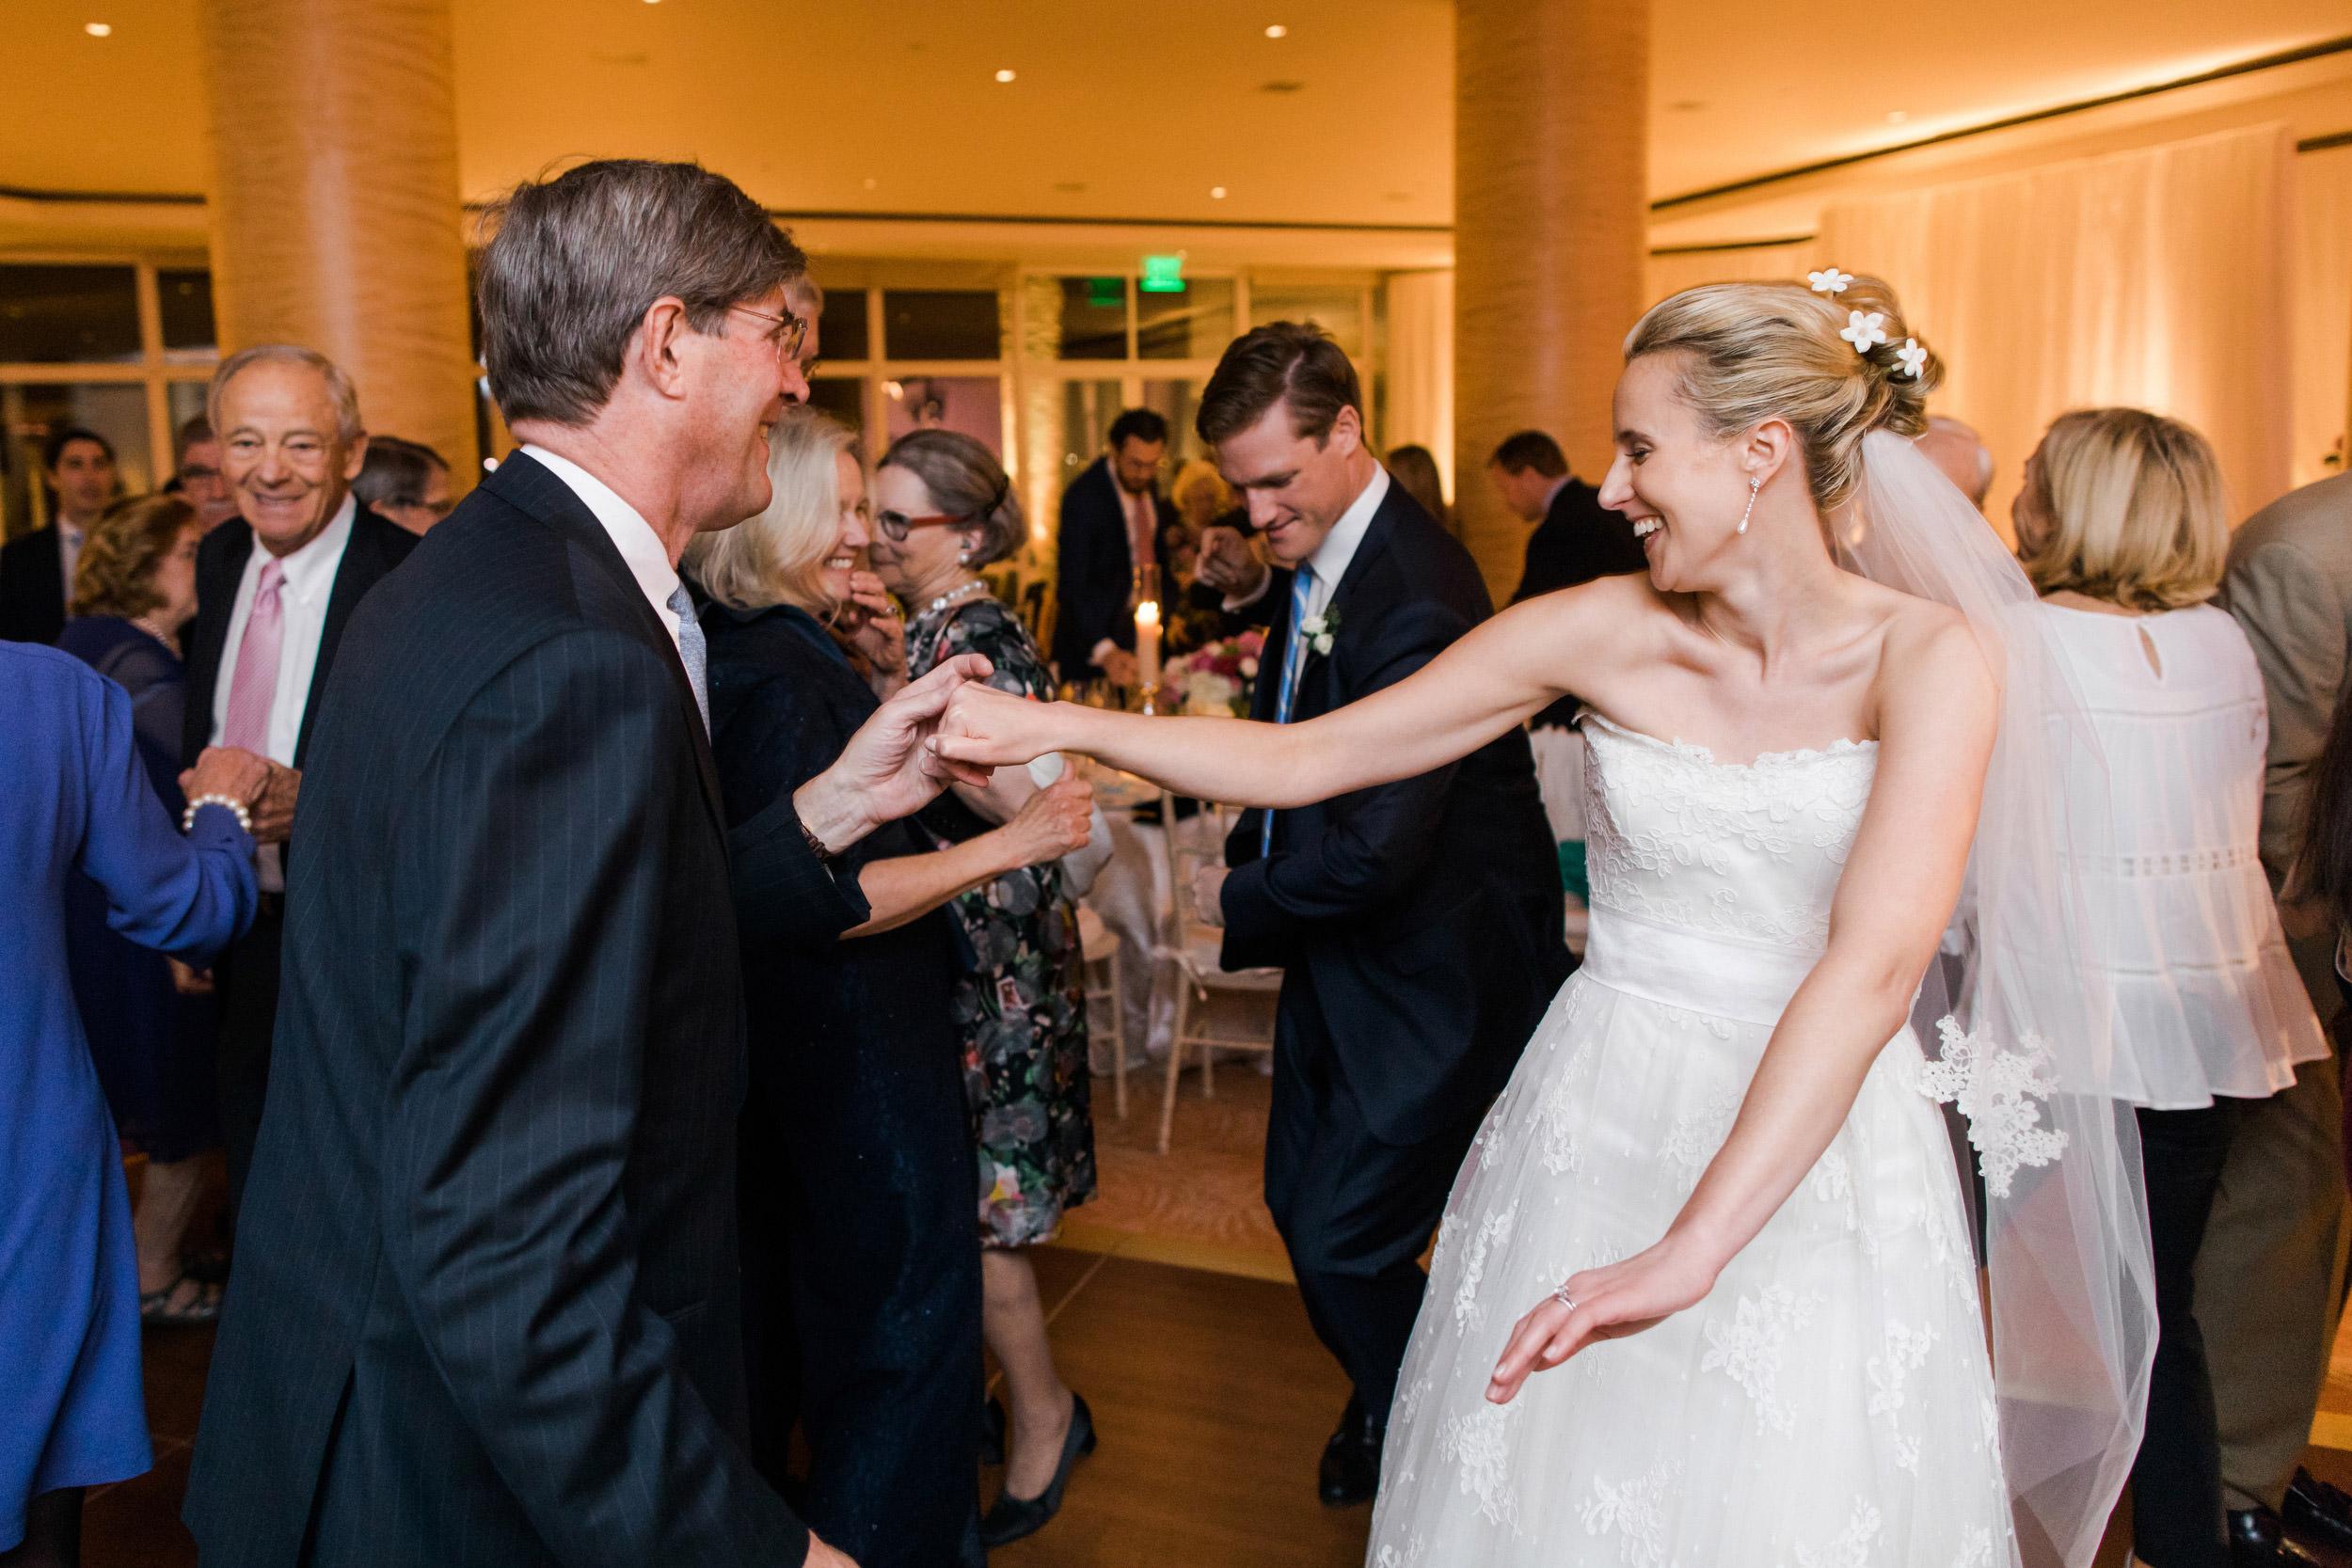 biltmore_santa_barbara_wedding_photos_coral_casino_059.jpg